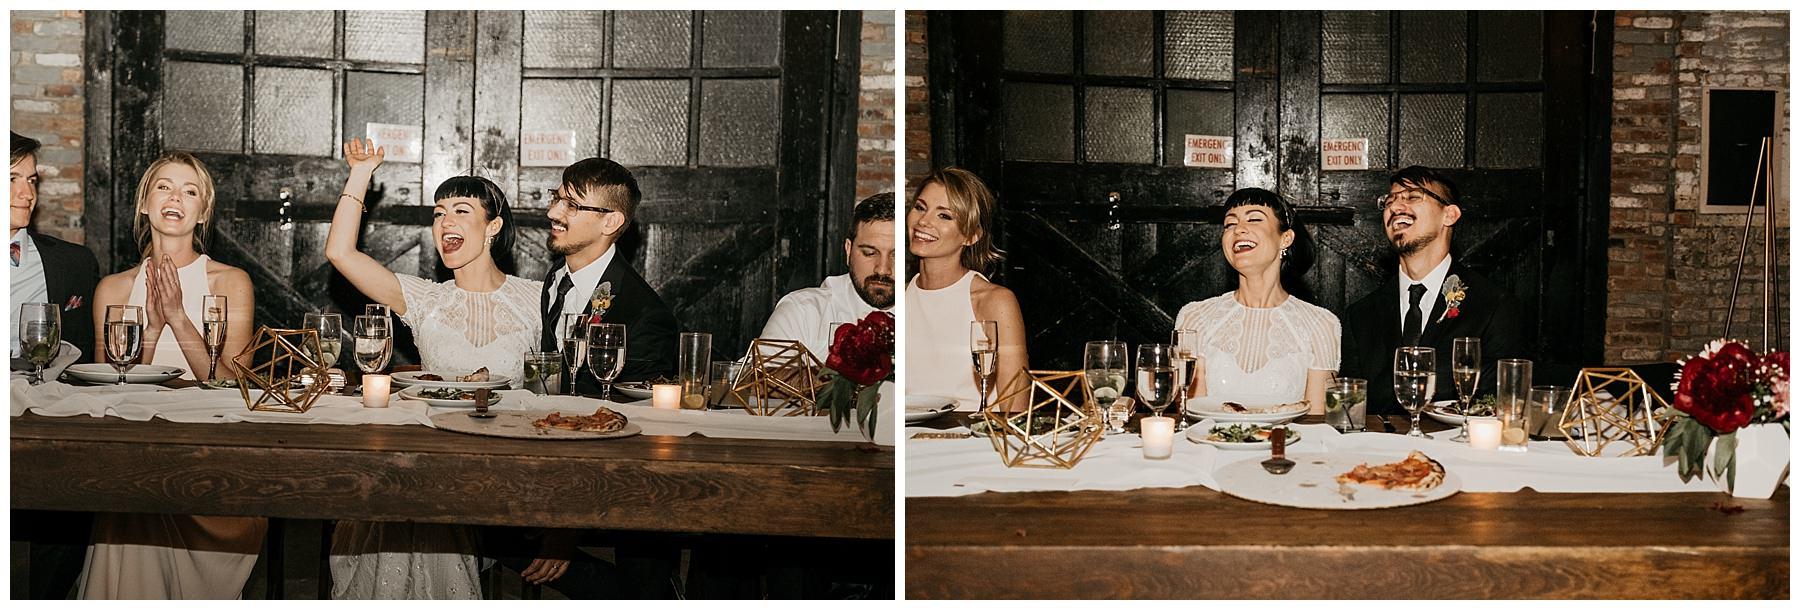 Jon and Jen New York Wedding-231.jpg